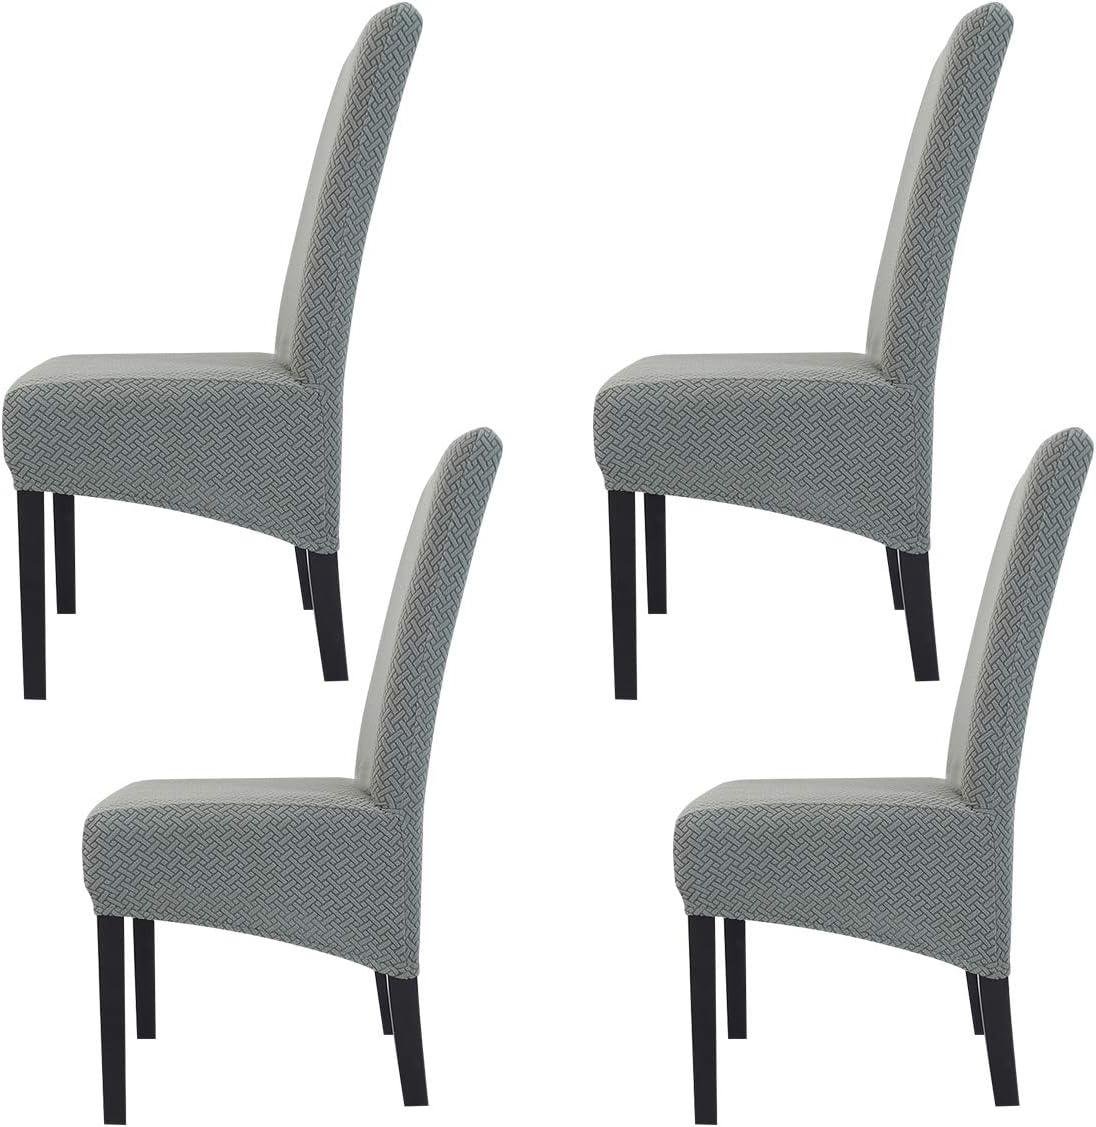 Fundas de Silla de Comedor El/ásticas y Modernas,Hengweiuk Fundas para sillas Pack de 4 6 Fundas sillas Comedor Lavable Extra/íble Comedor Extra/íble Funda,Duradera Modern Decor Restaurante